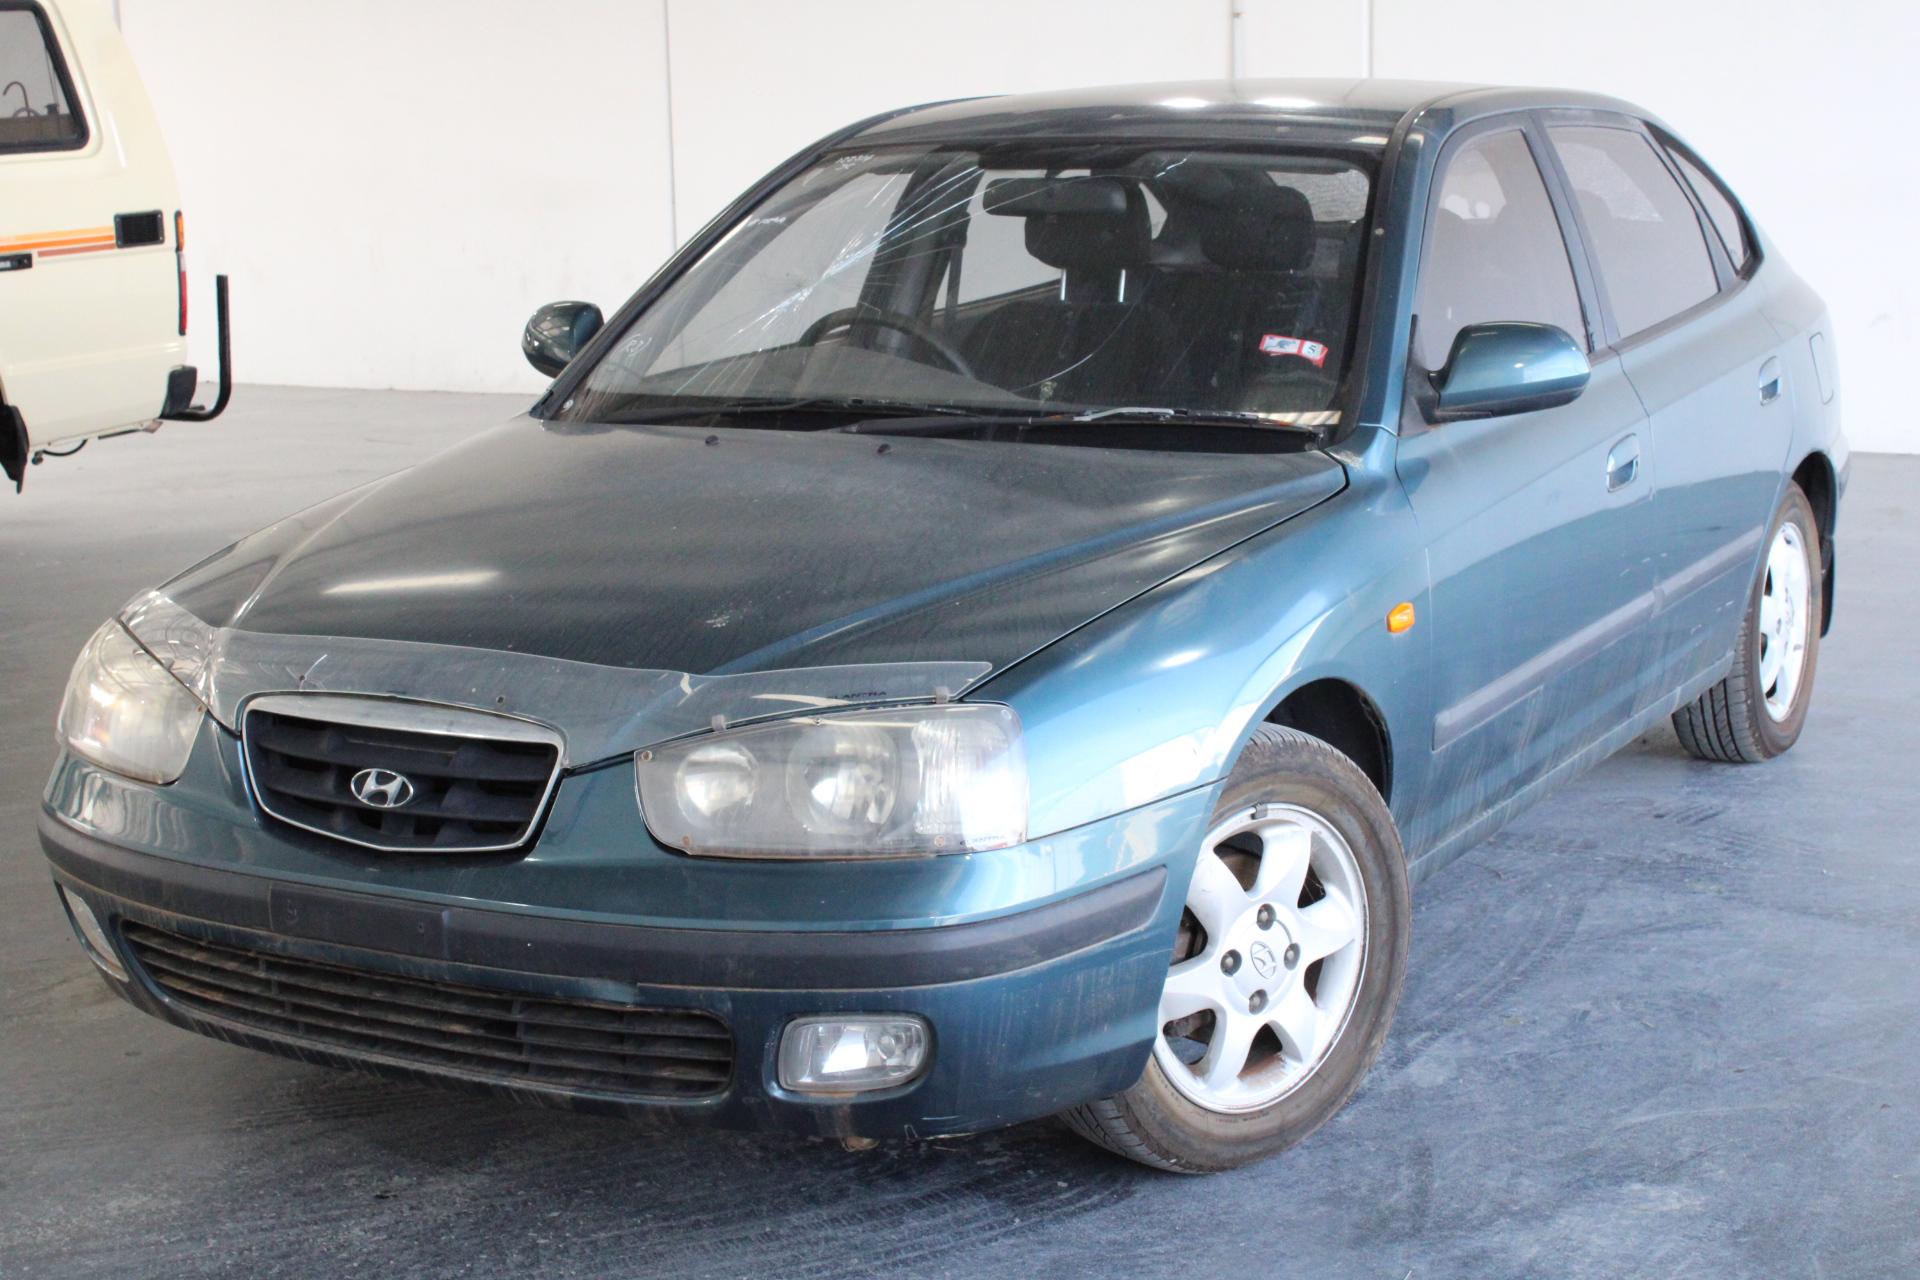 2003 Hyundai Elantra GLS XD Automatic Hatchback